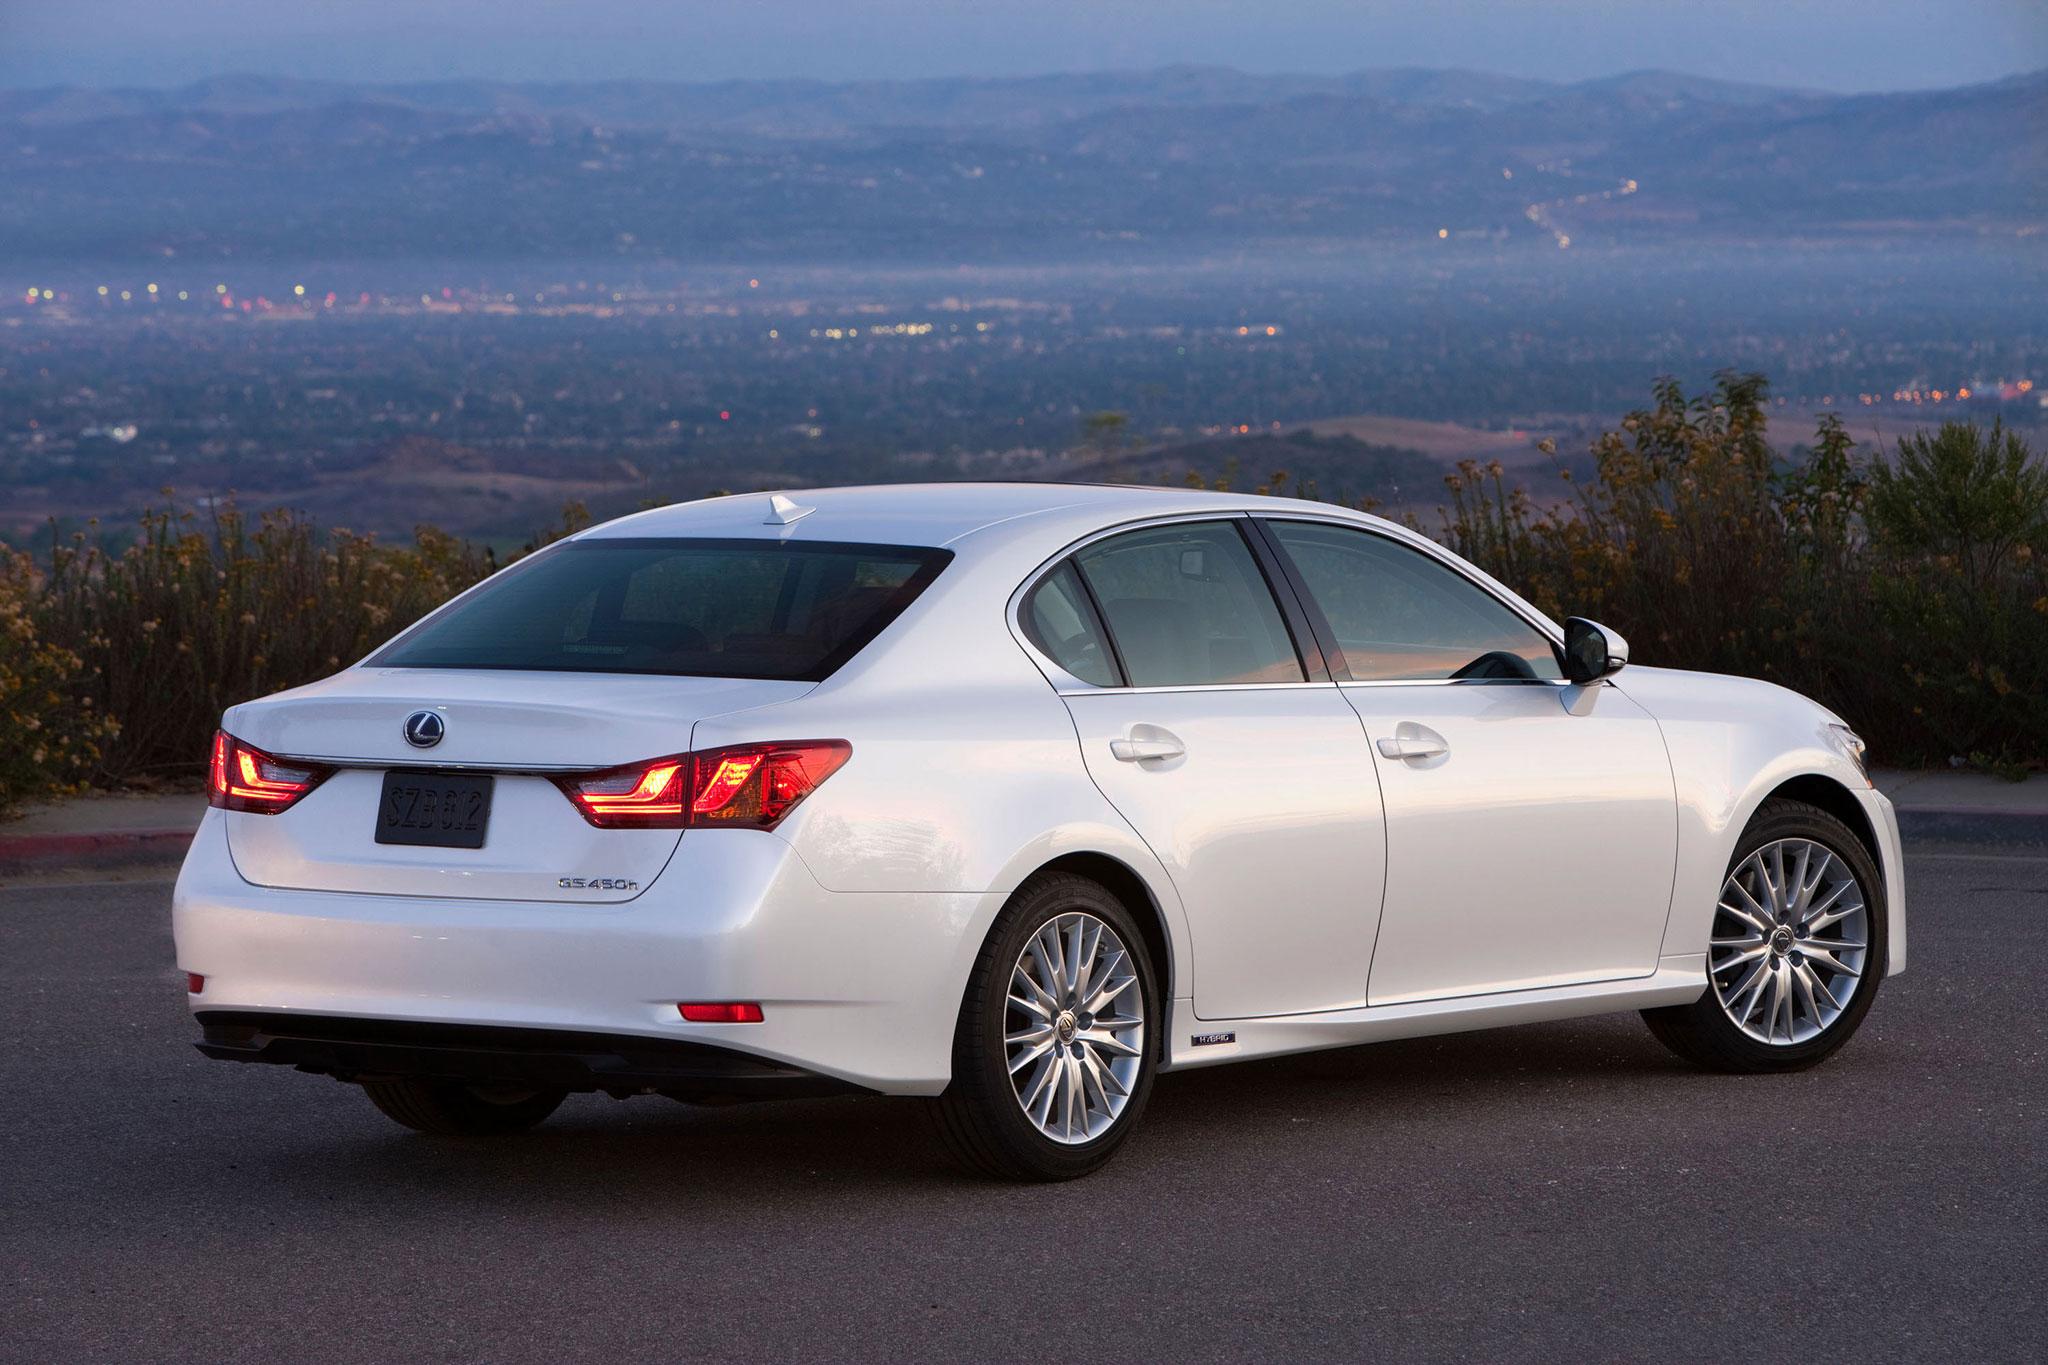 2014 Lexus GS 450h Information and photos MOMENTcar